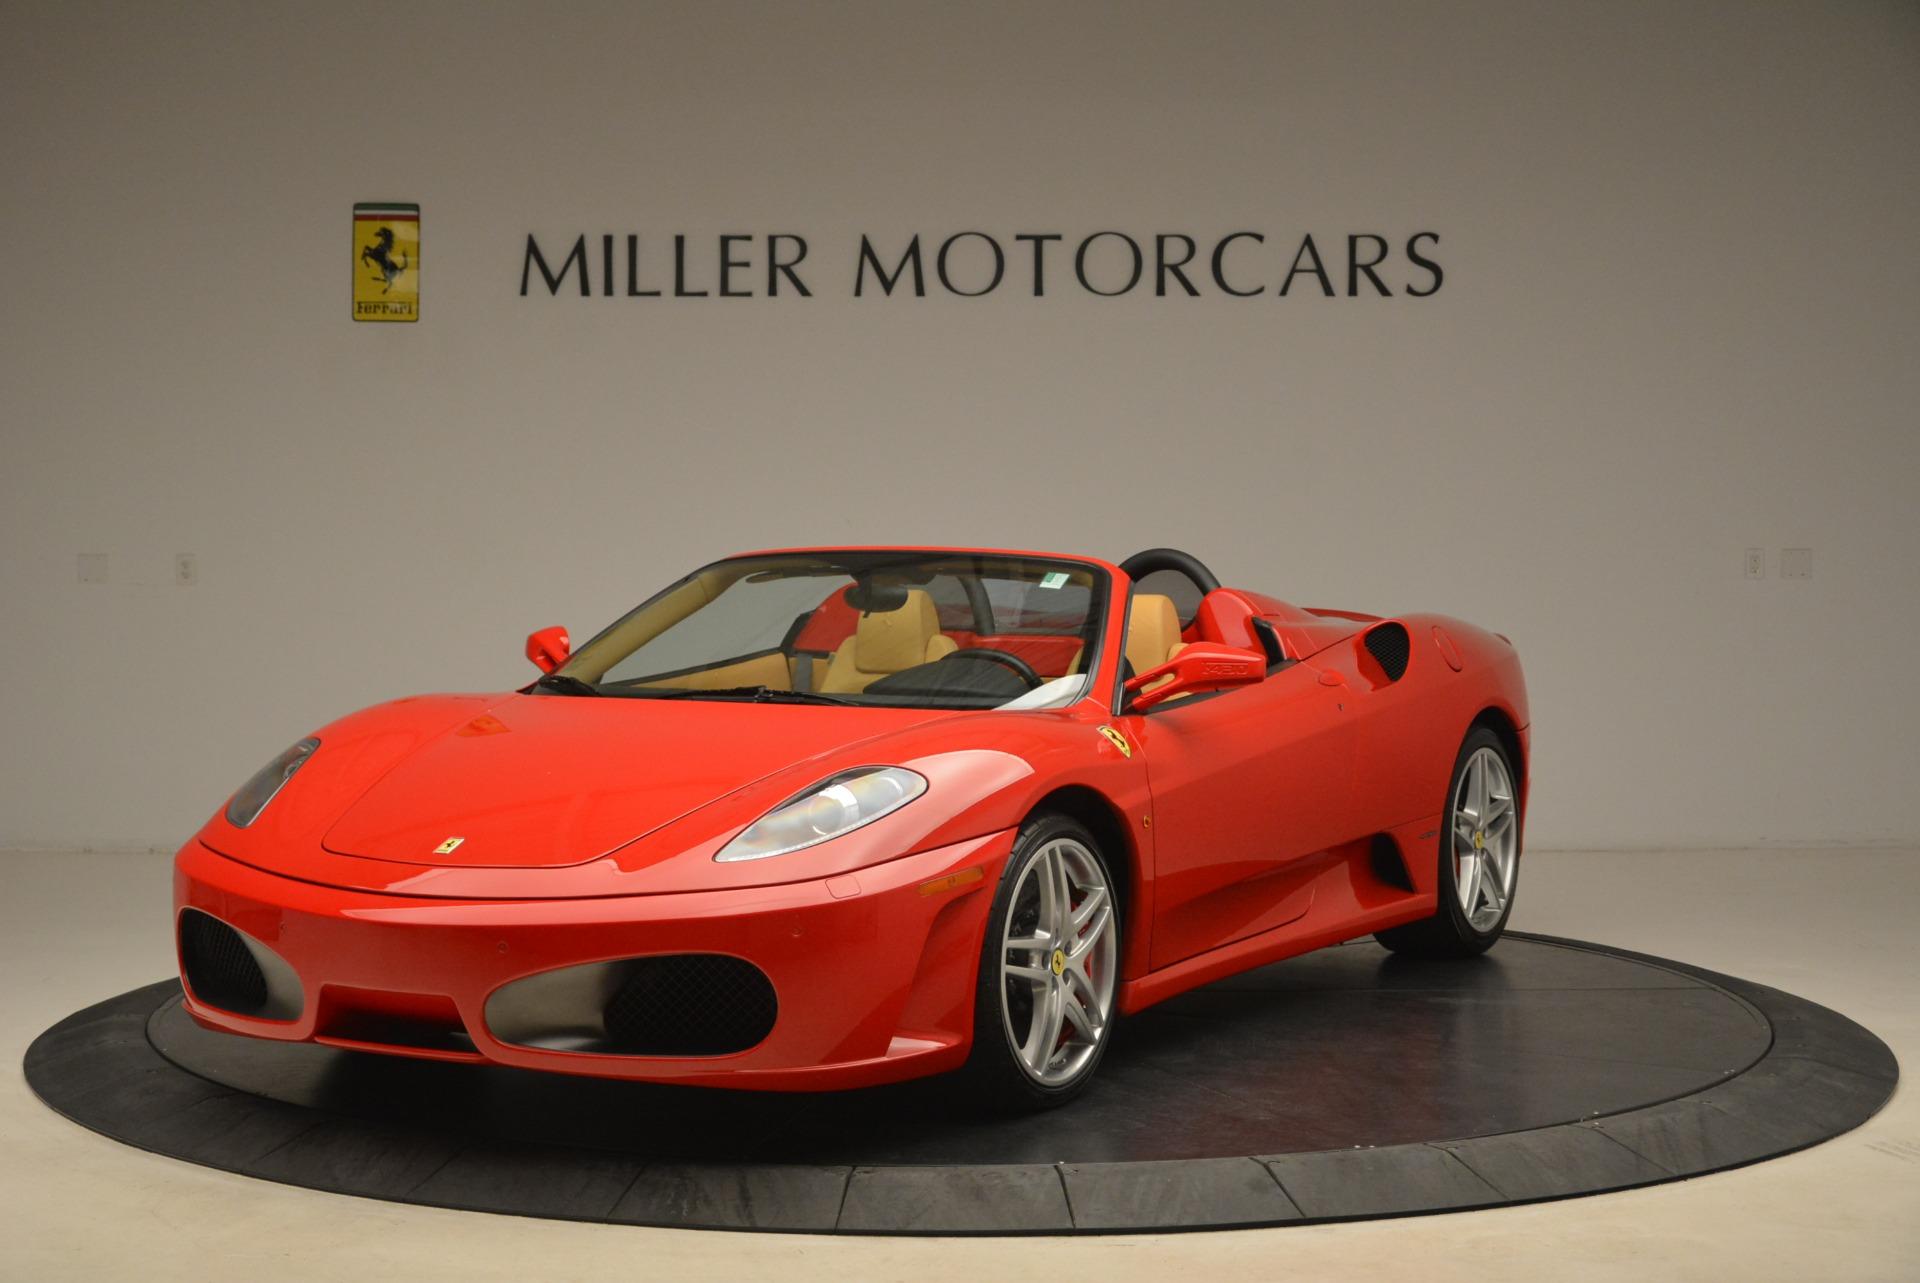 Used 2008 Ferrari F430 Spider for sale Sold at Alfa Romeo of Westport in Westport CT 06880 1